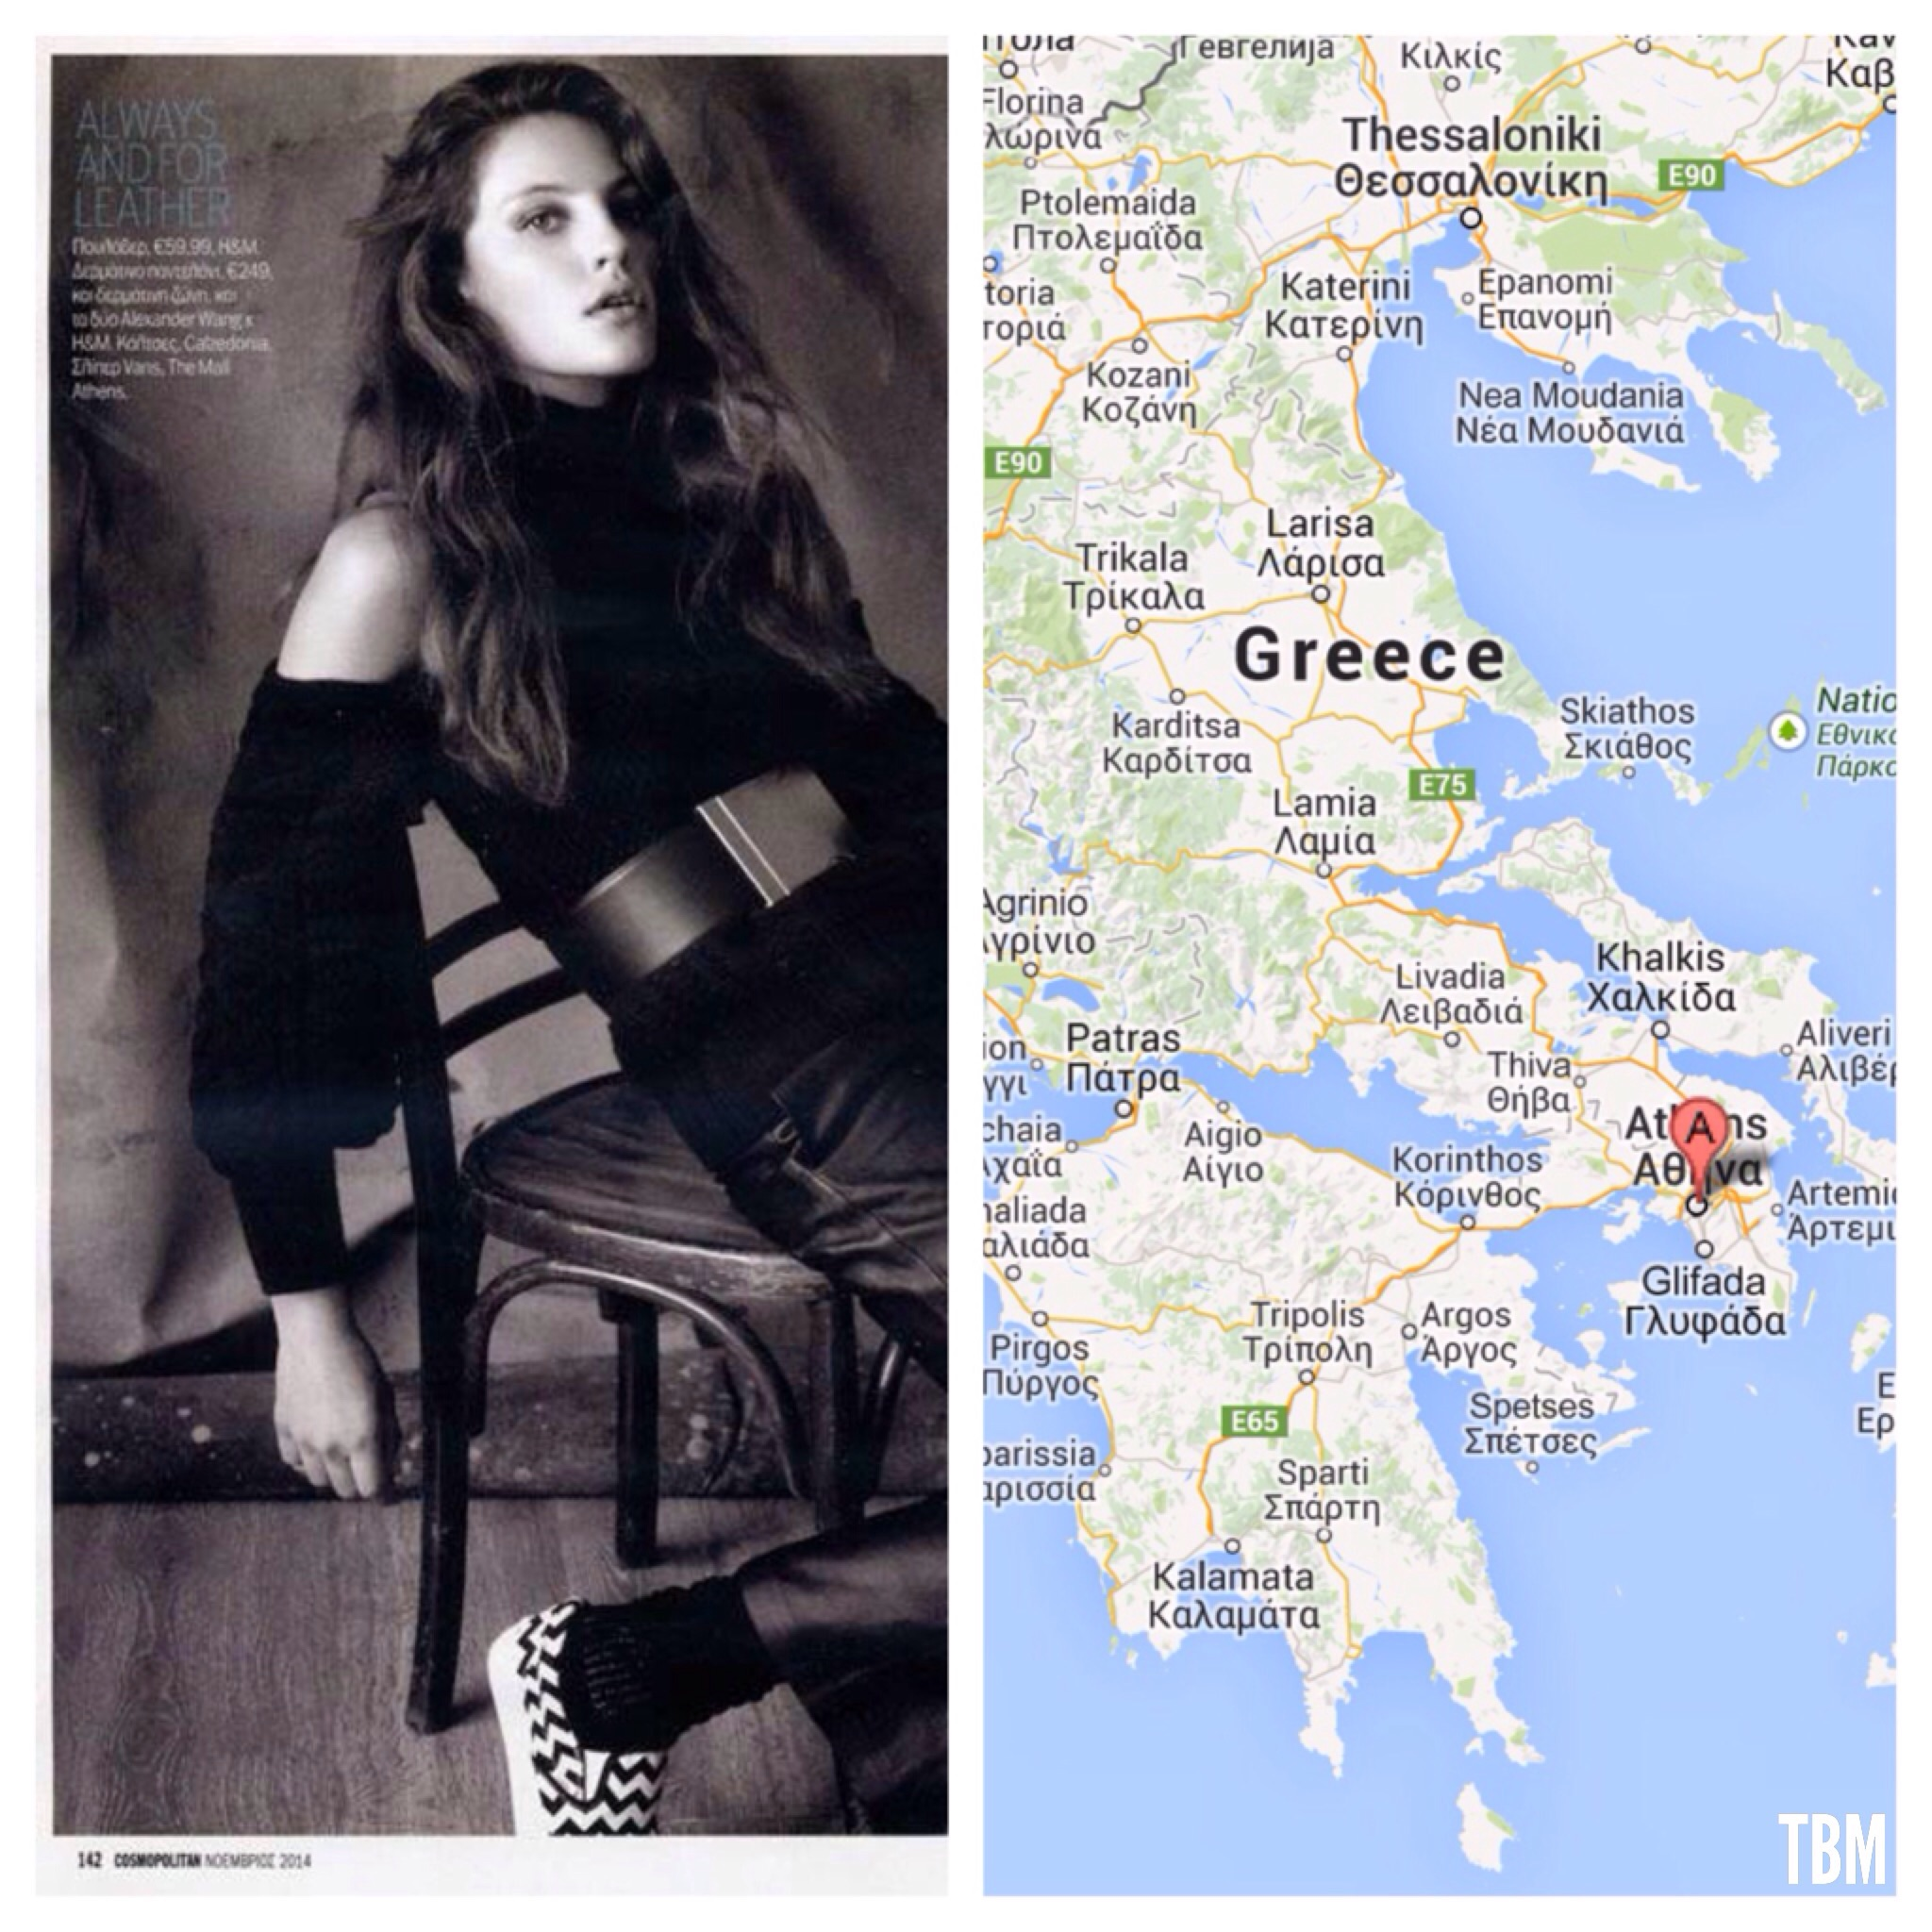 Cosmopolitan Greece by George Katsanakis | Athens, Greece via Google Maps